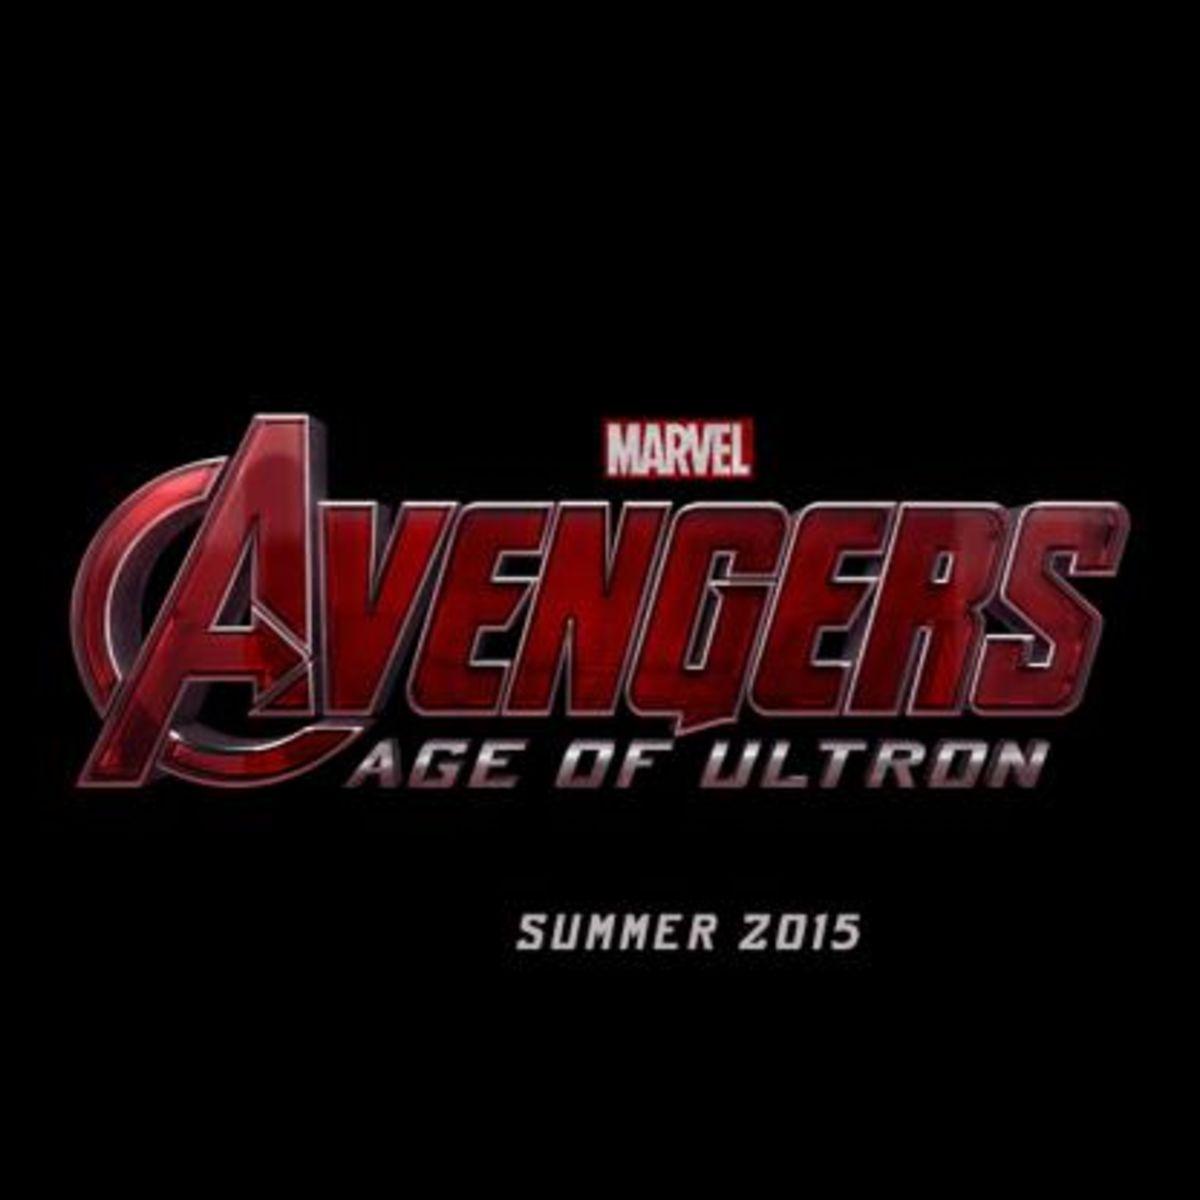 avengers-age-of-ultron-logo-teaser-comic-con1_0.jpg